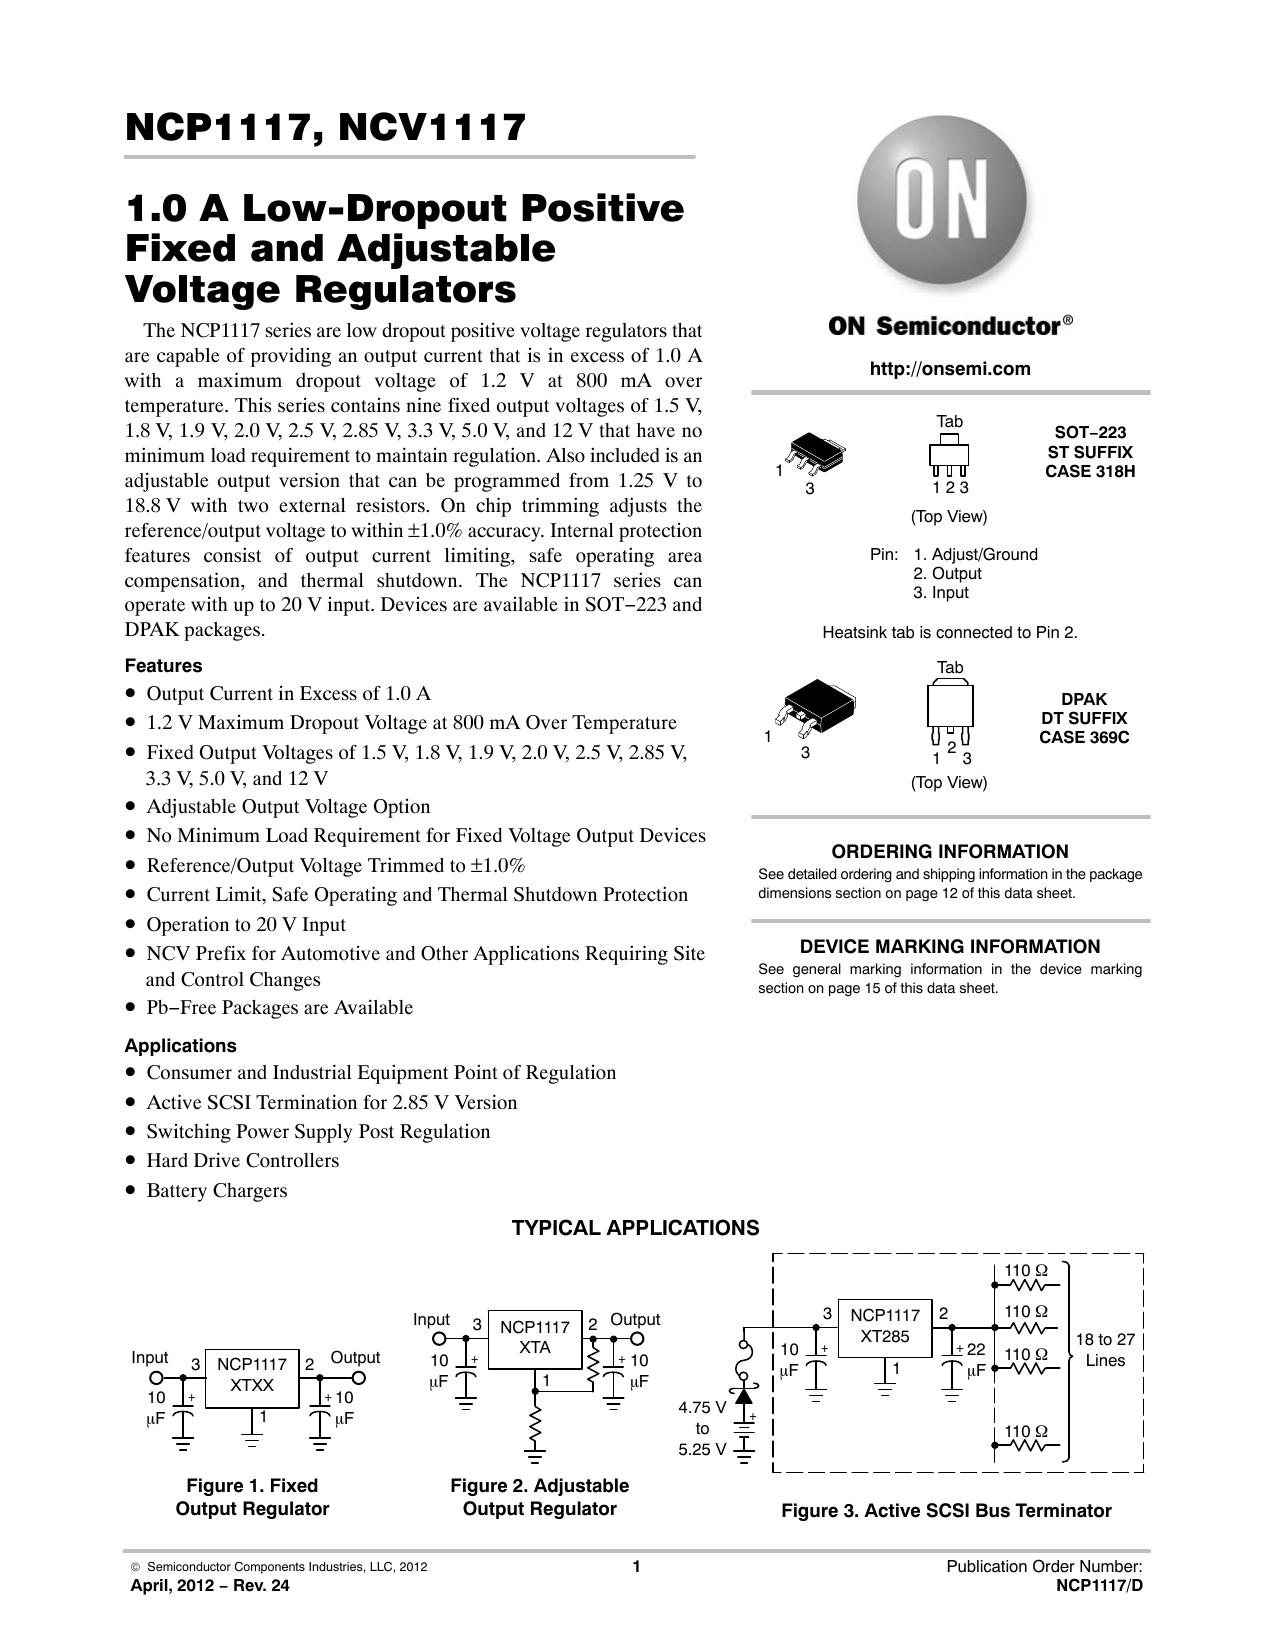 10 PCS NCP1117ST33T3G SOT-223 1.0 A LOW-DROPOUT POSITIVE FIXED REGULATORS